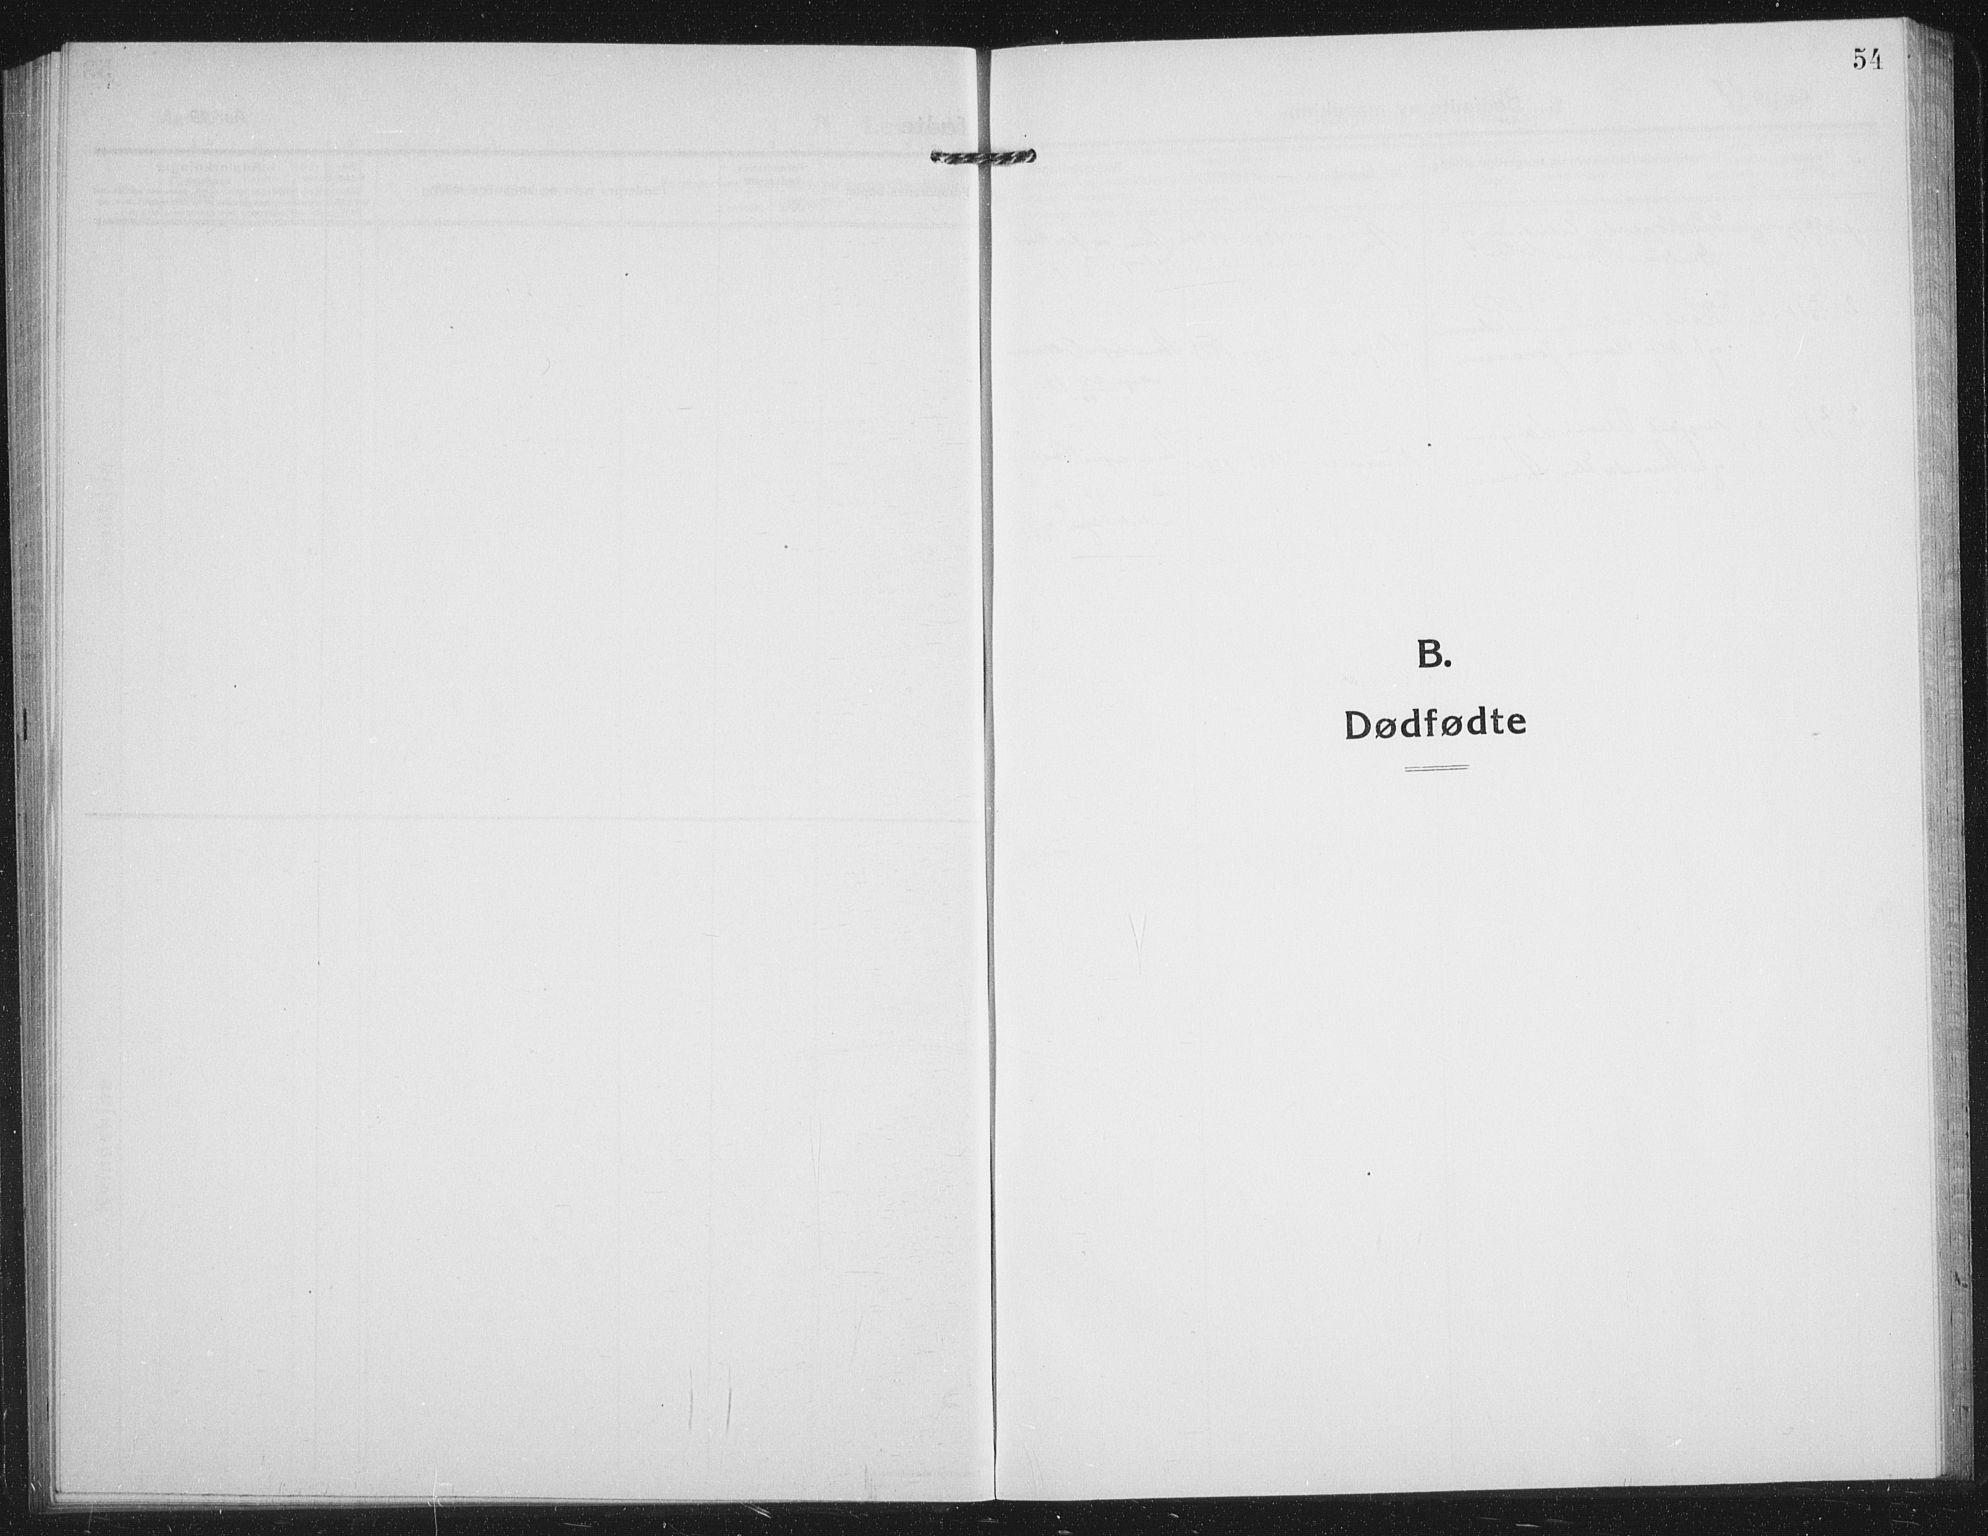 SATØ, Tranøy sokneprestkontor, I/Ia/Iab/L0019klokker: Klokkerbok nr. 19, 1914-1940, s. 54